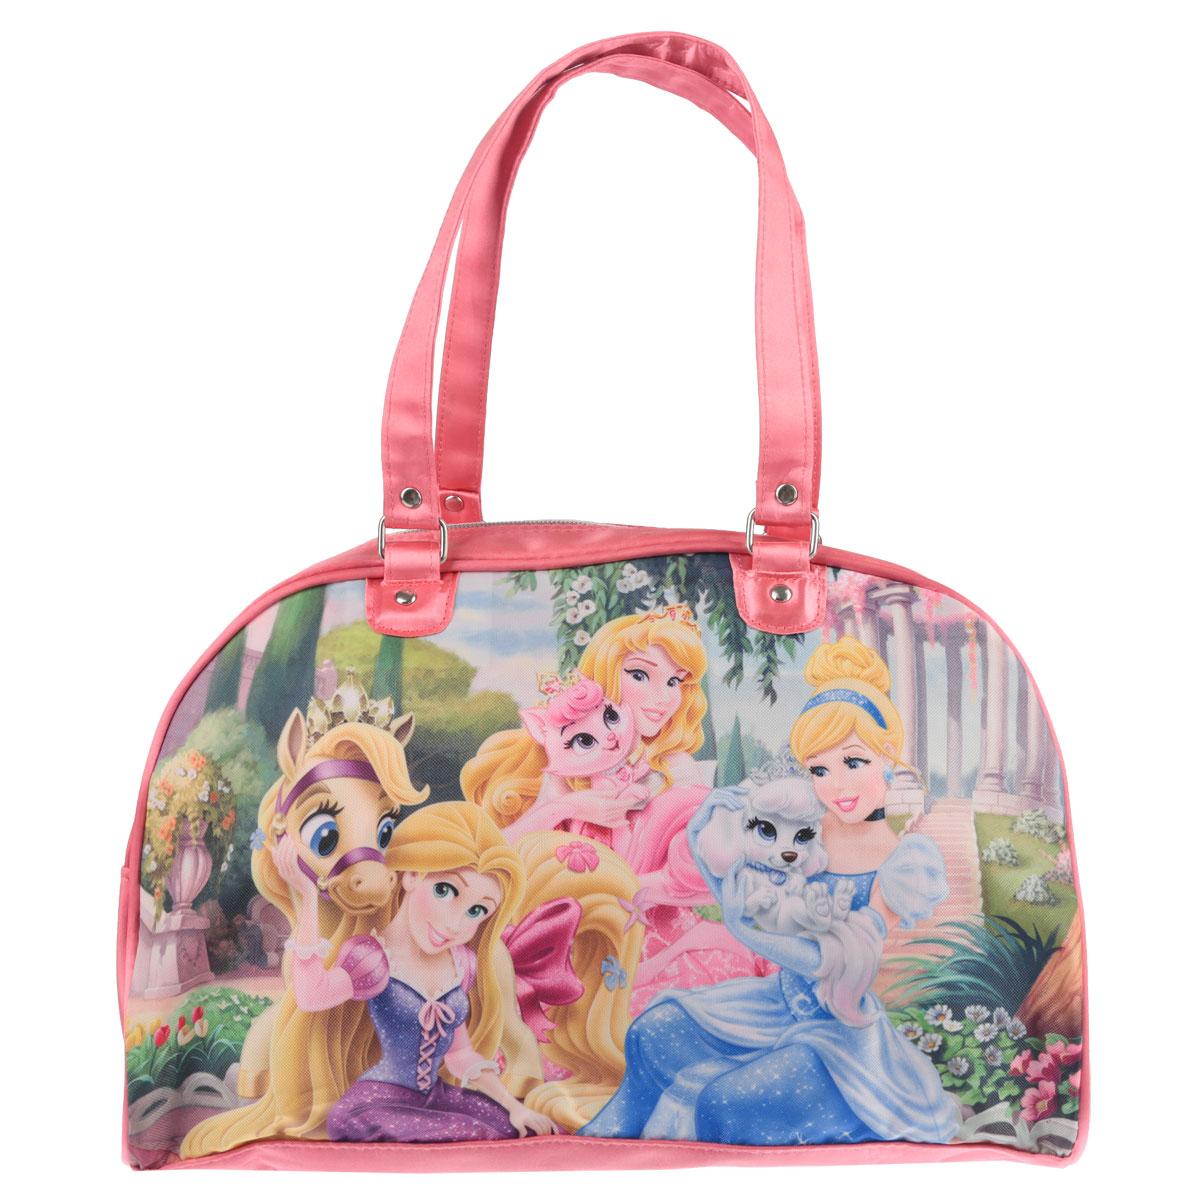 Сумочка Princess, цвет: розовый. PRCB-UT4-4034 сумочка princess цвет розовый prcb ut4 4017